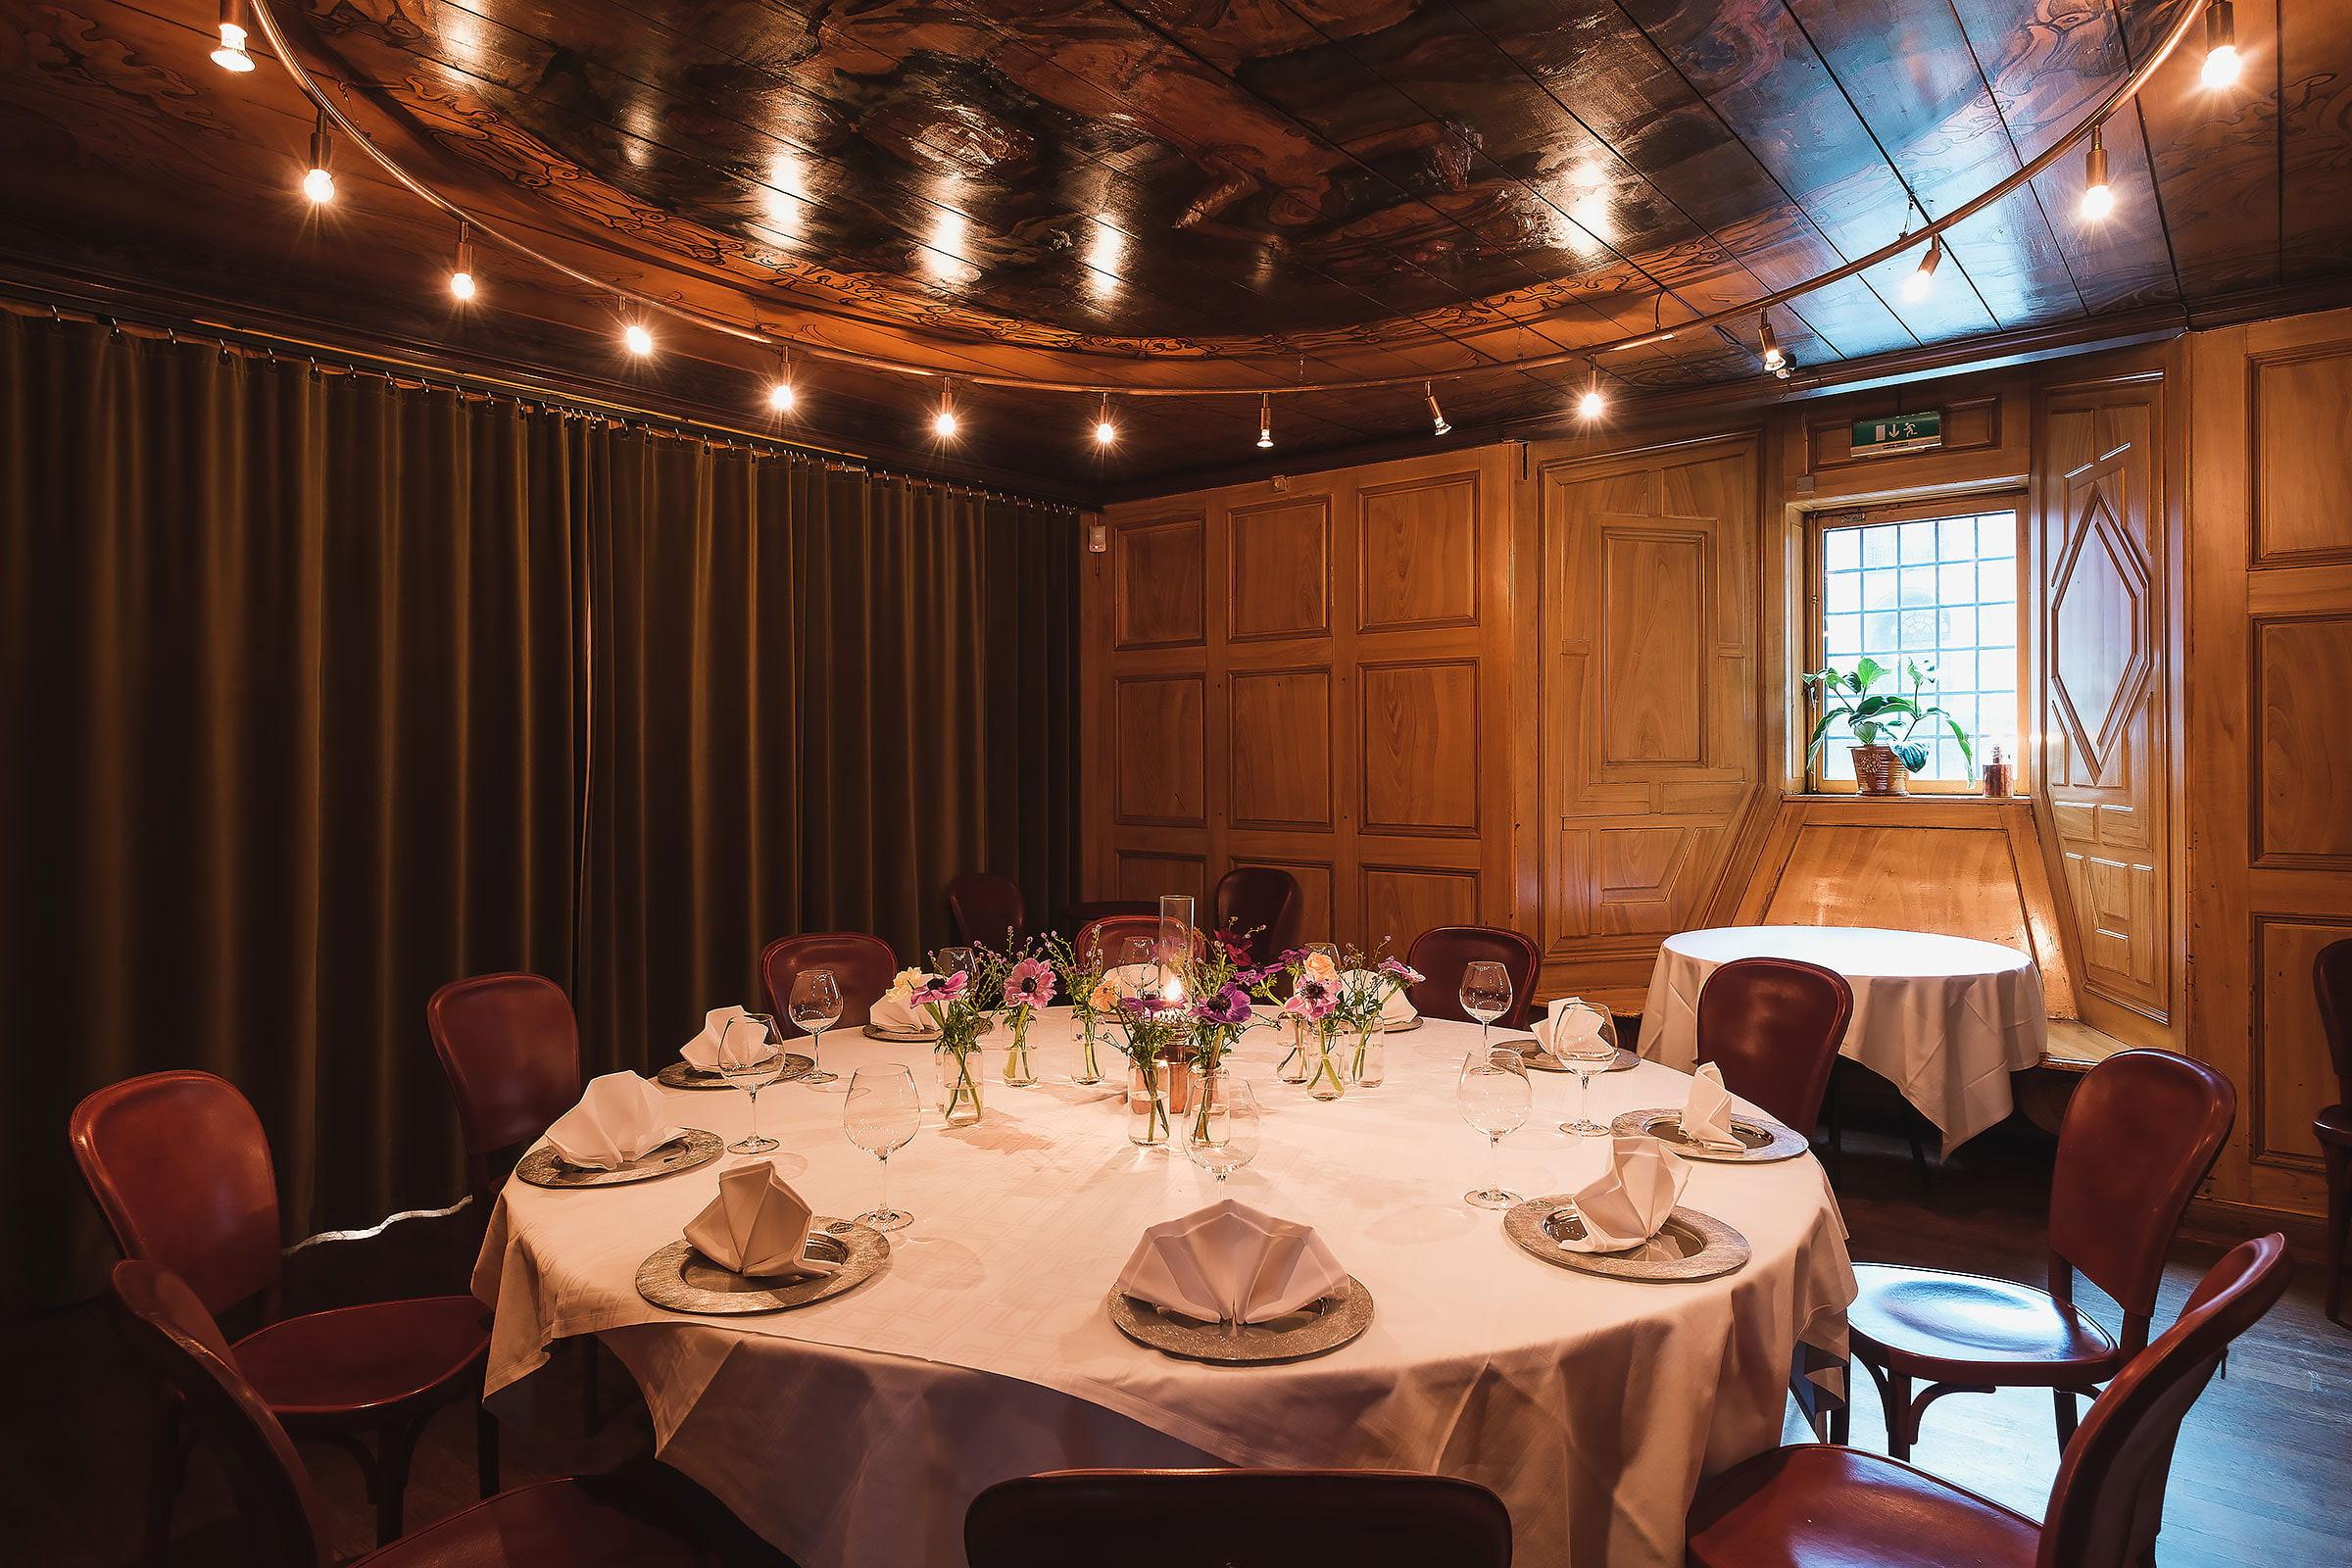 Restaurants in Stockholm with a chambre séparée